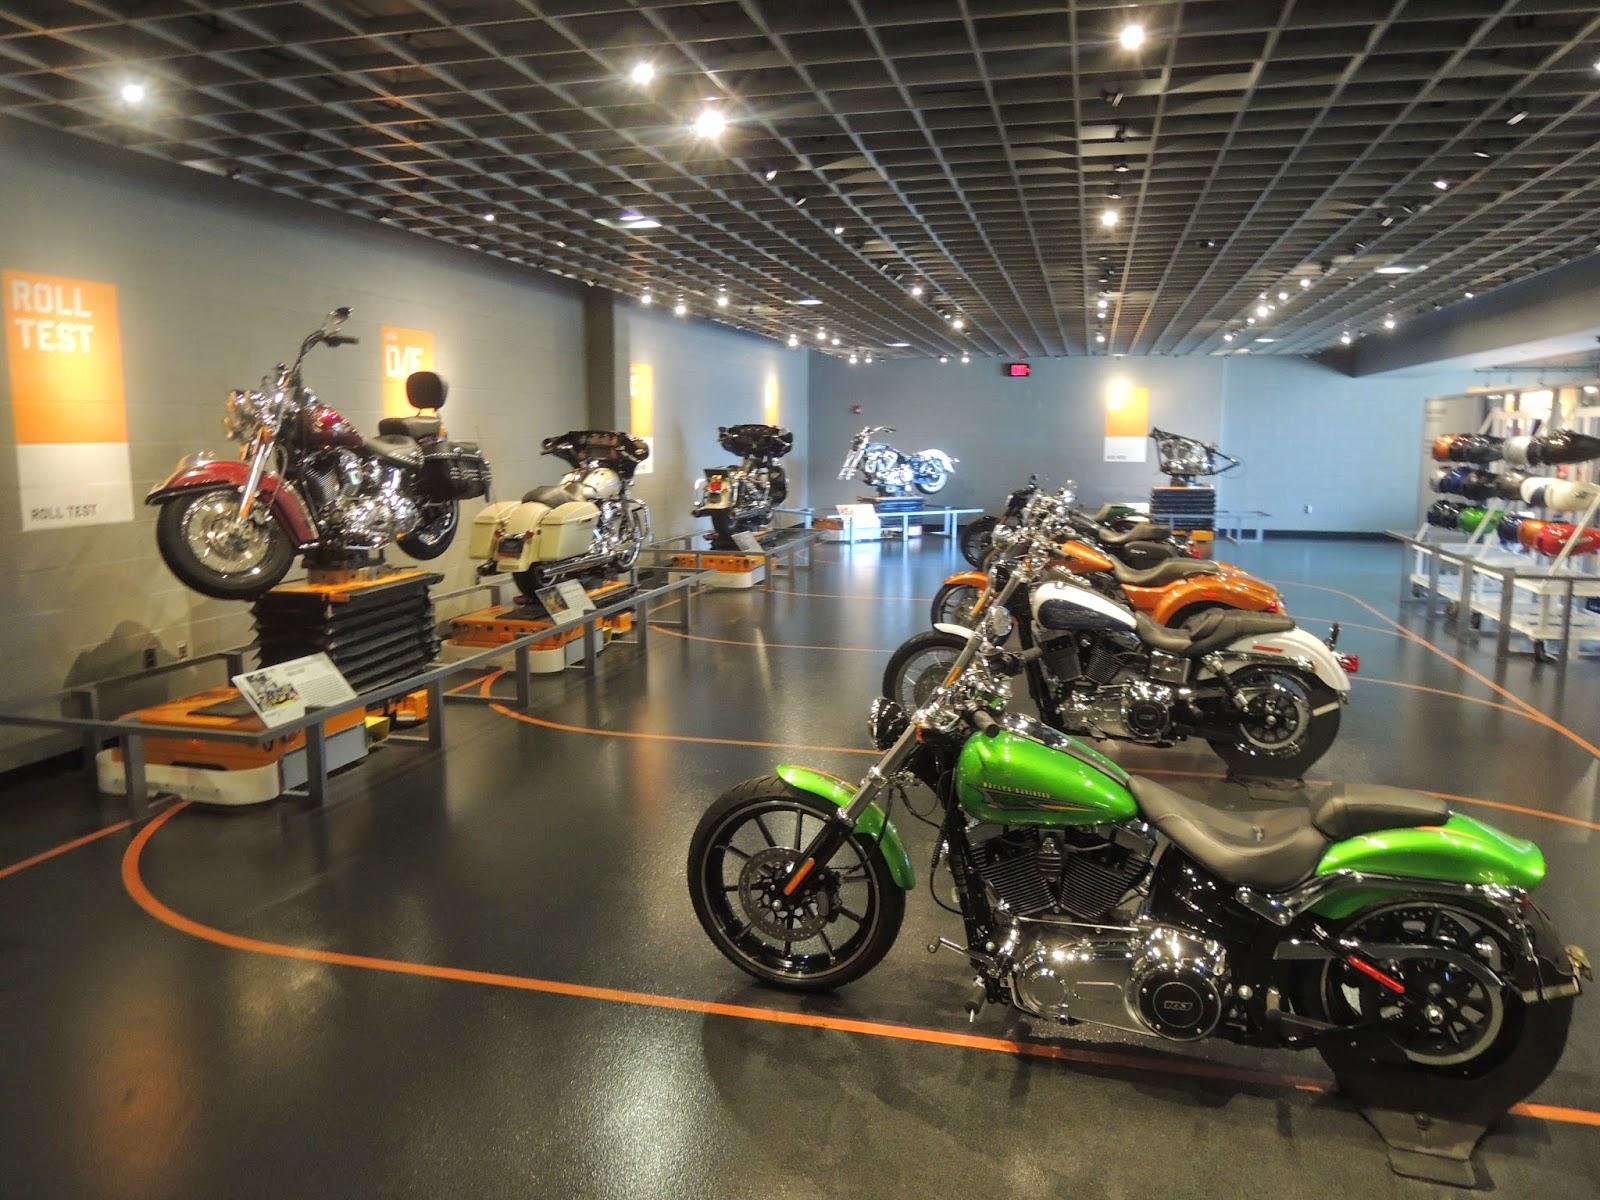 Harley Davidson Tour York PA | Nelson's BMW airhead motorcycles